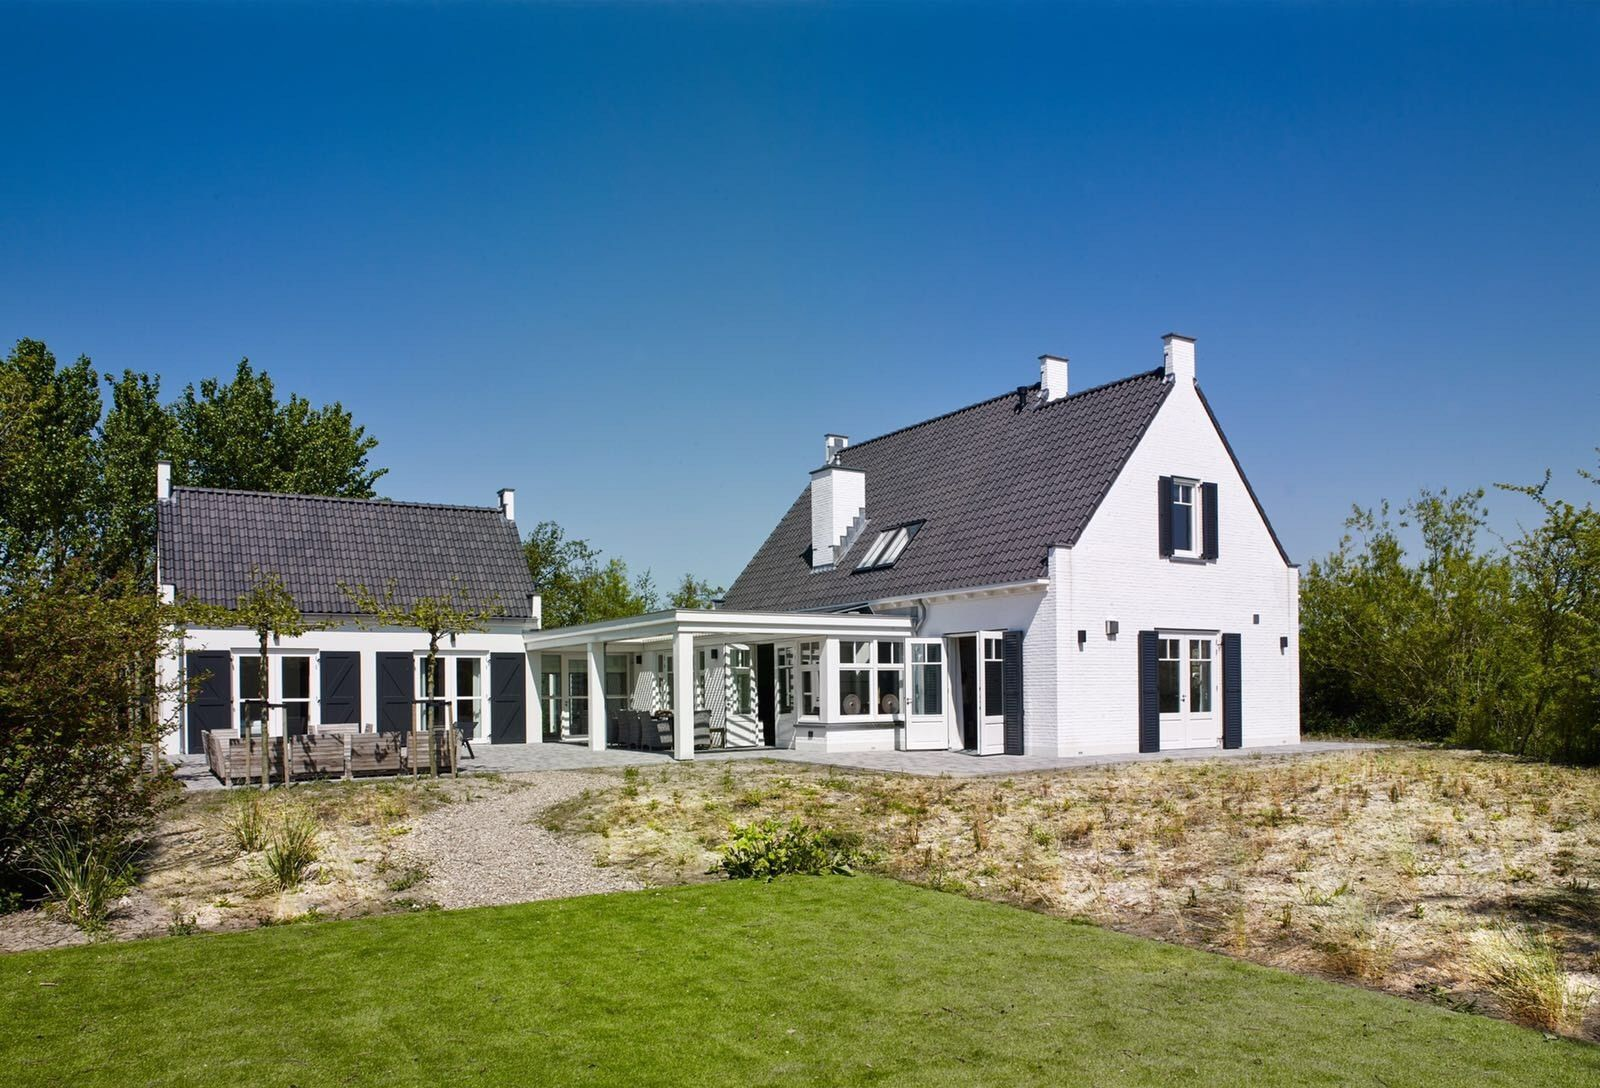 Ferienhaus - Westerweg 23 | Ouddorp